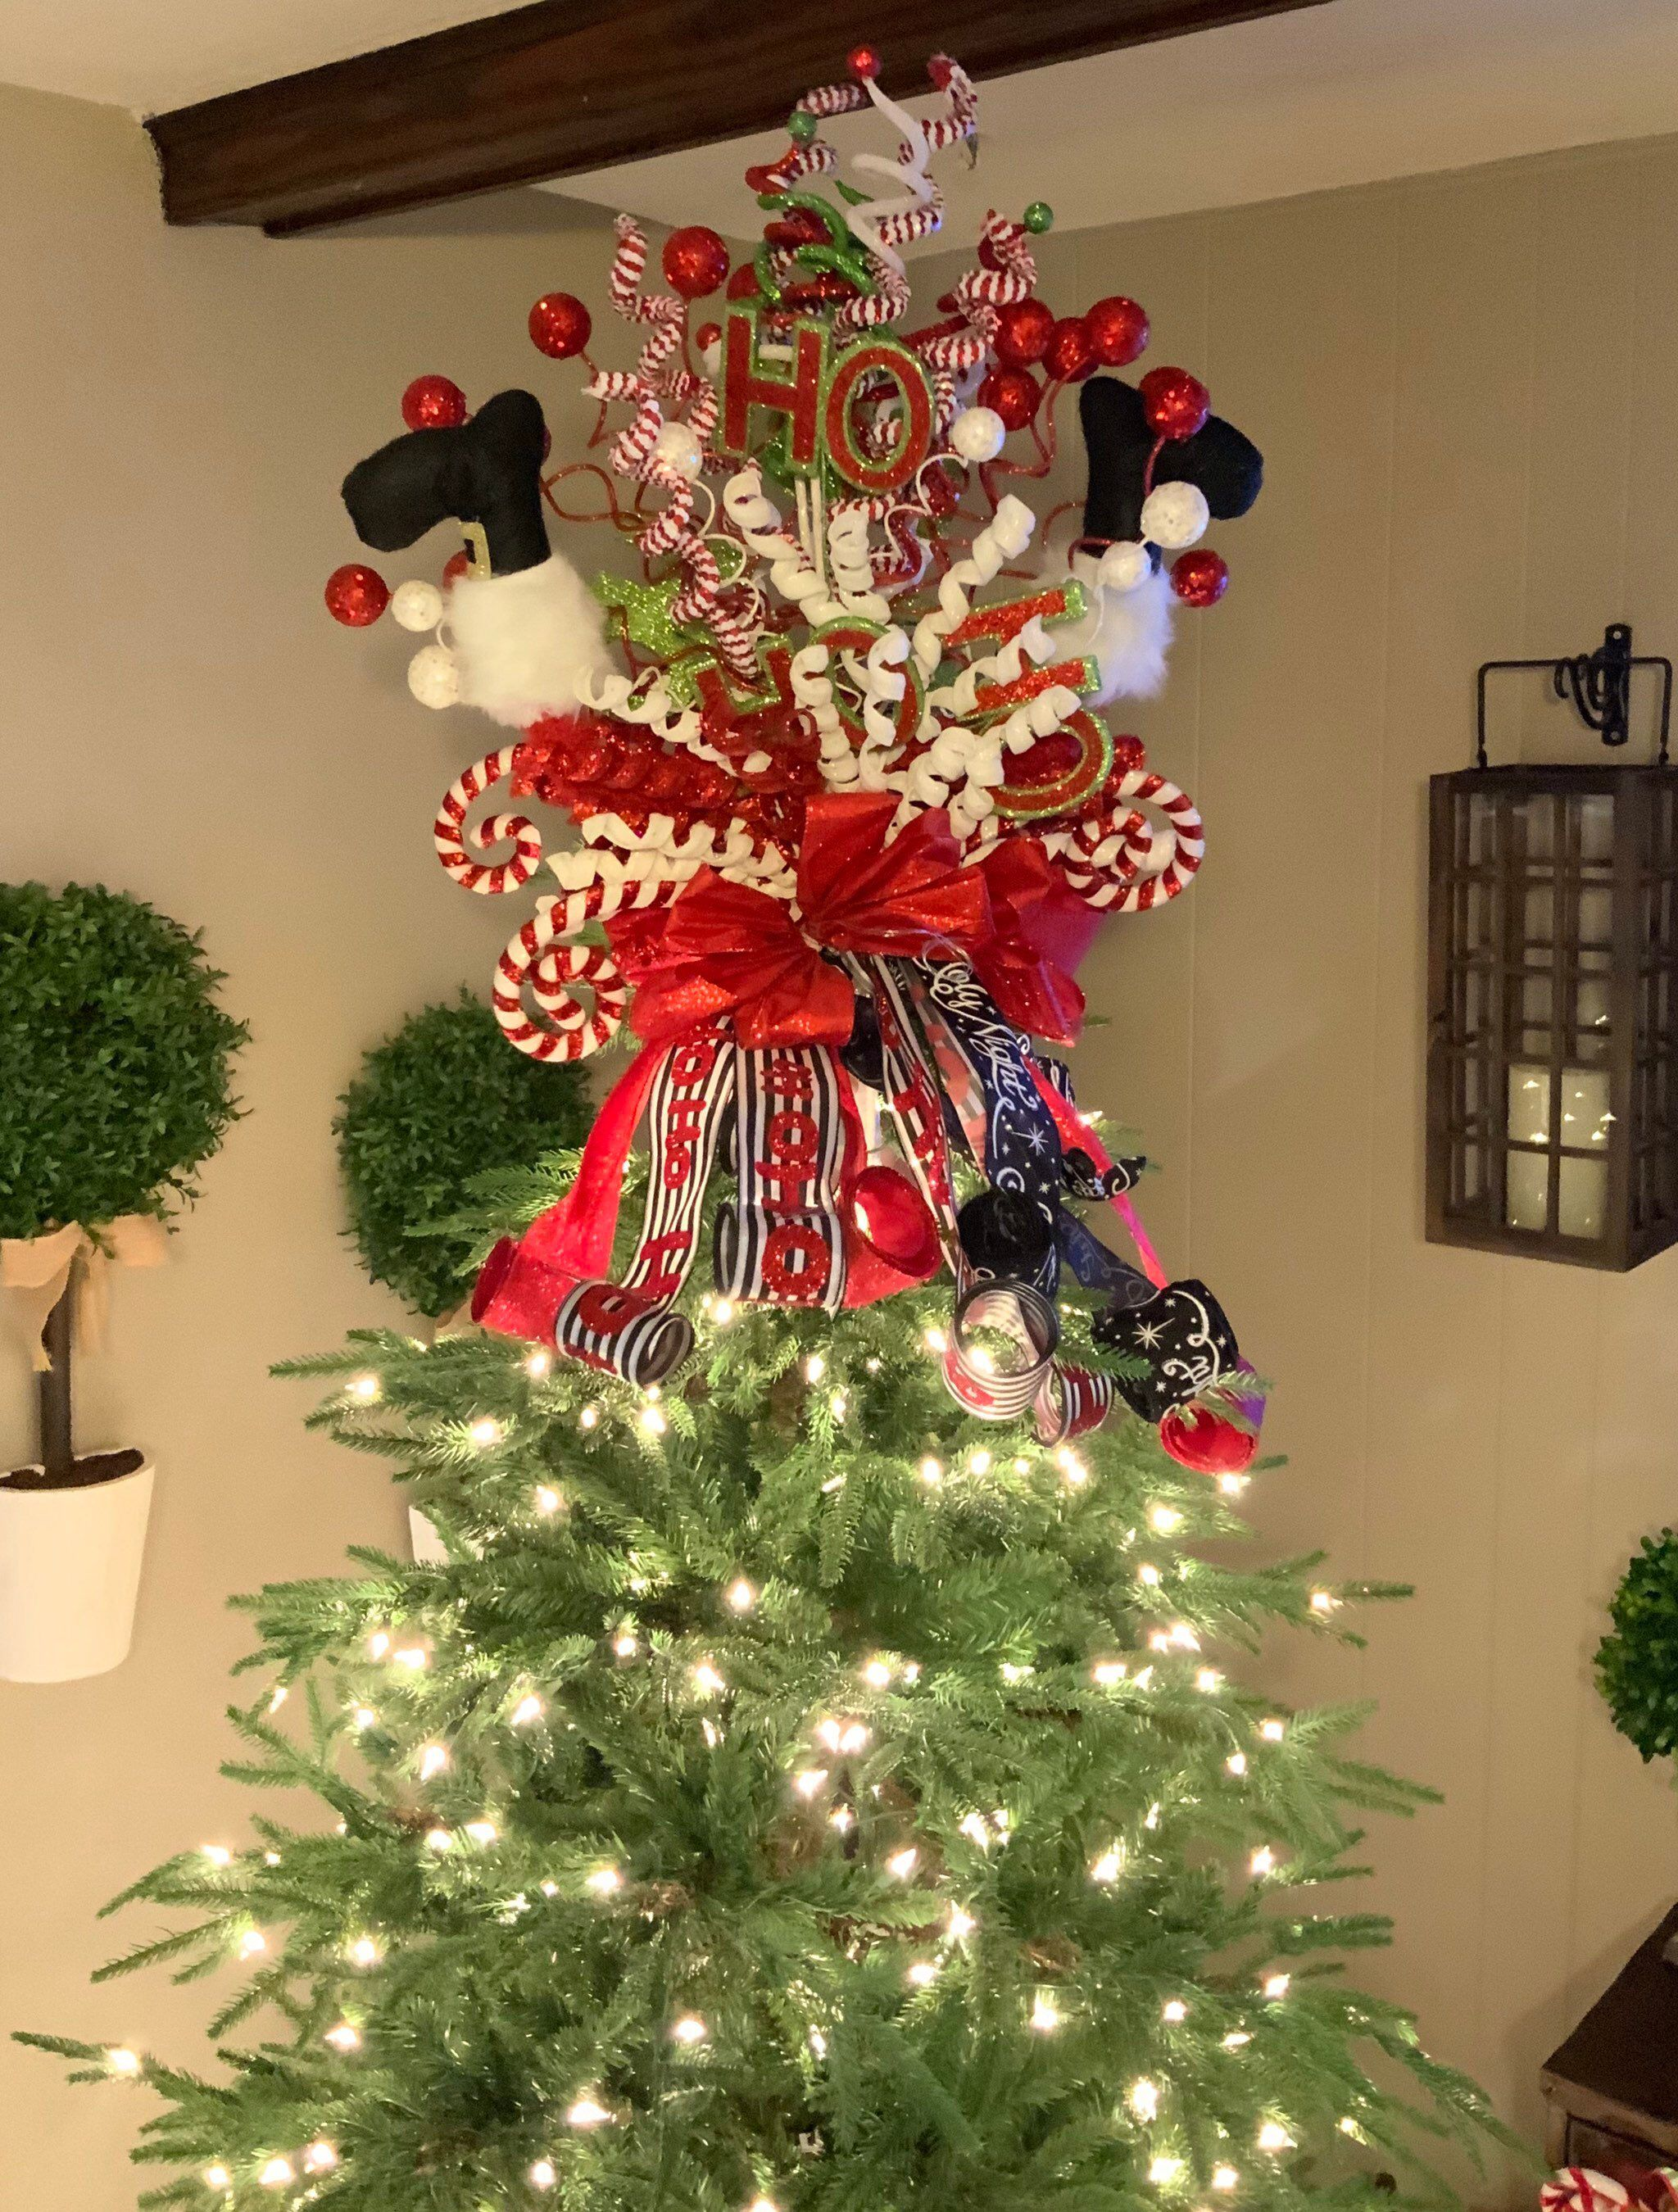 Tree Topper Santa Leg Tree Topper Christmas Tree Topper Etsy Diy Christmas Tree Topper Christmas Tree Toppers Christmas Tree Decorations